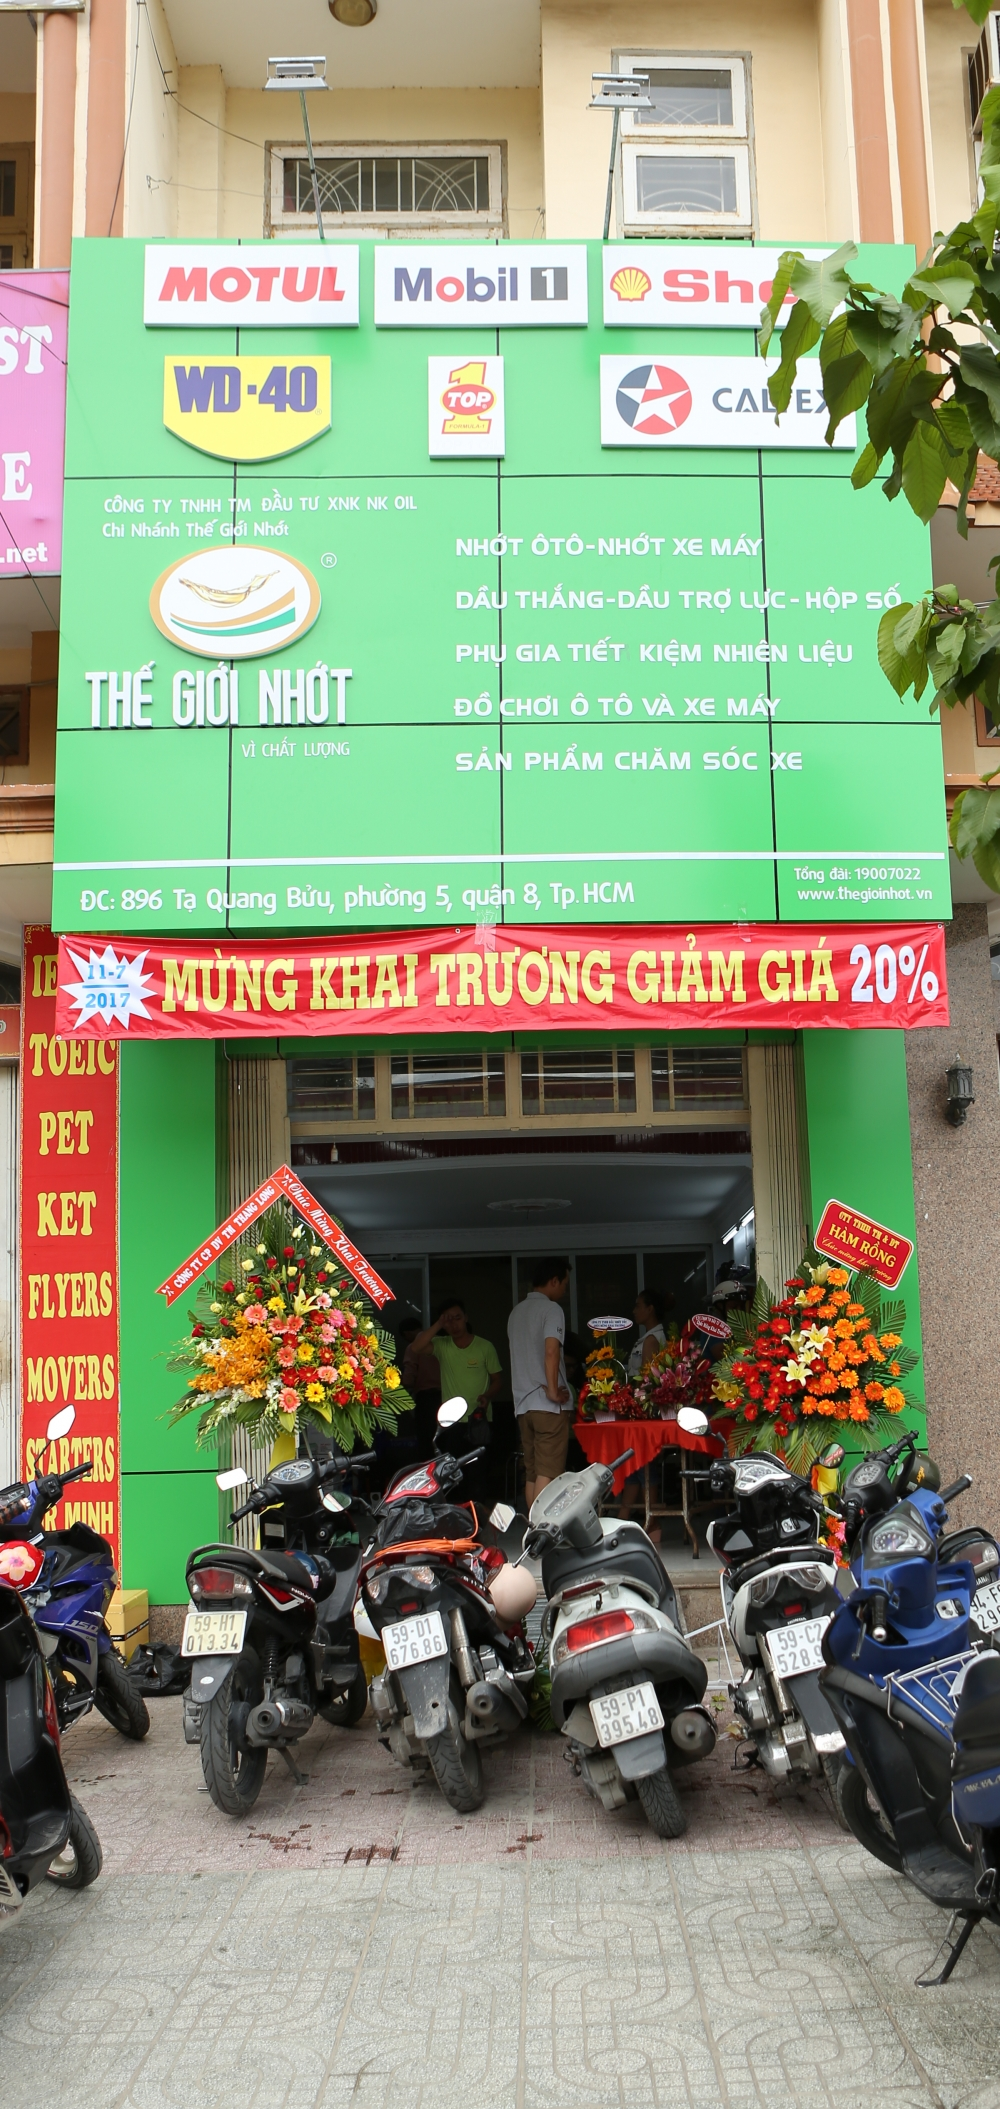 The gioi nhot Khai truong khuyen mai lon Giam gia 20 tat ca san pham